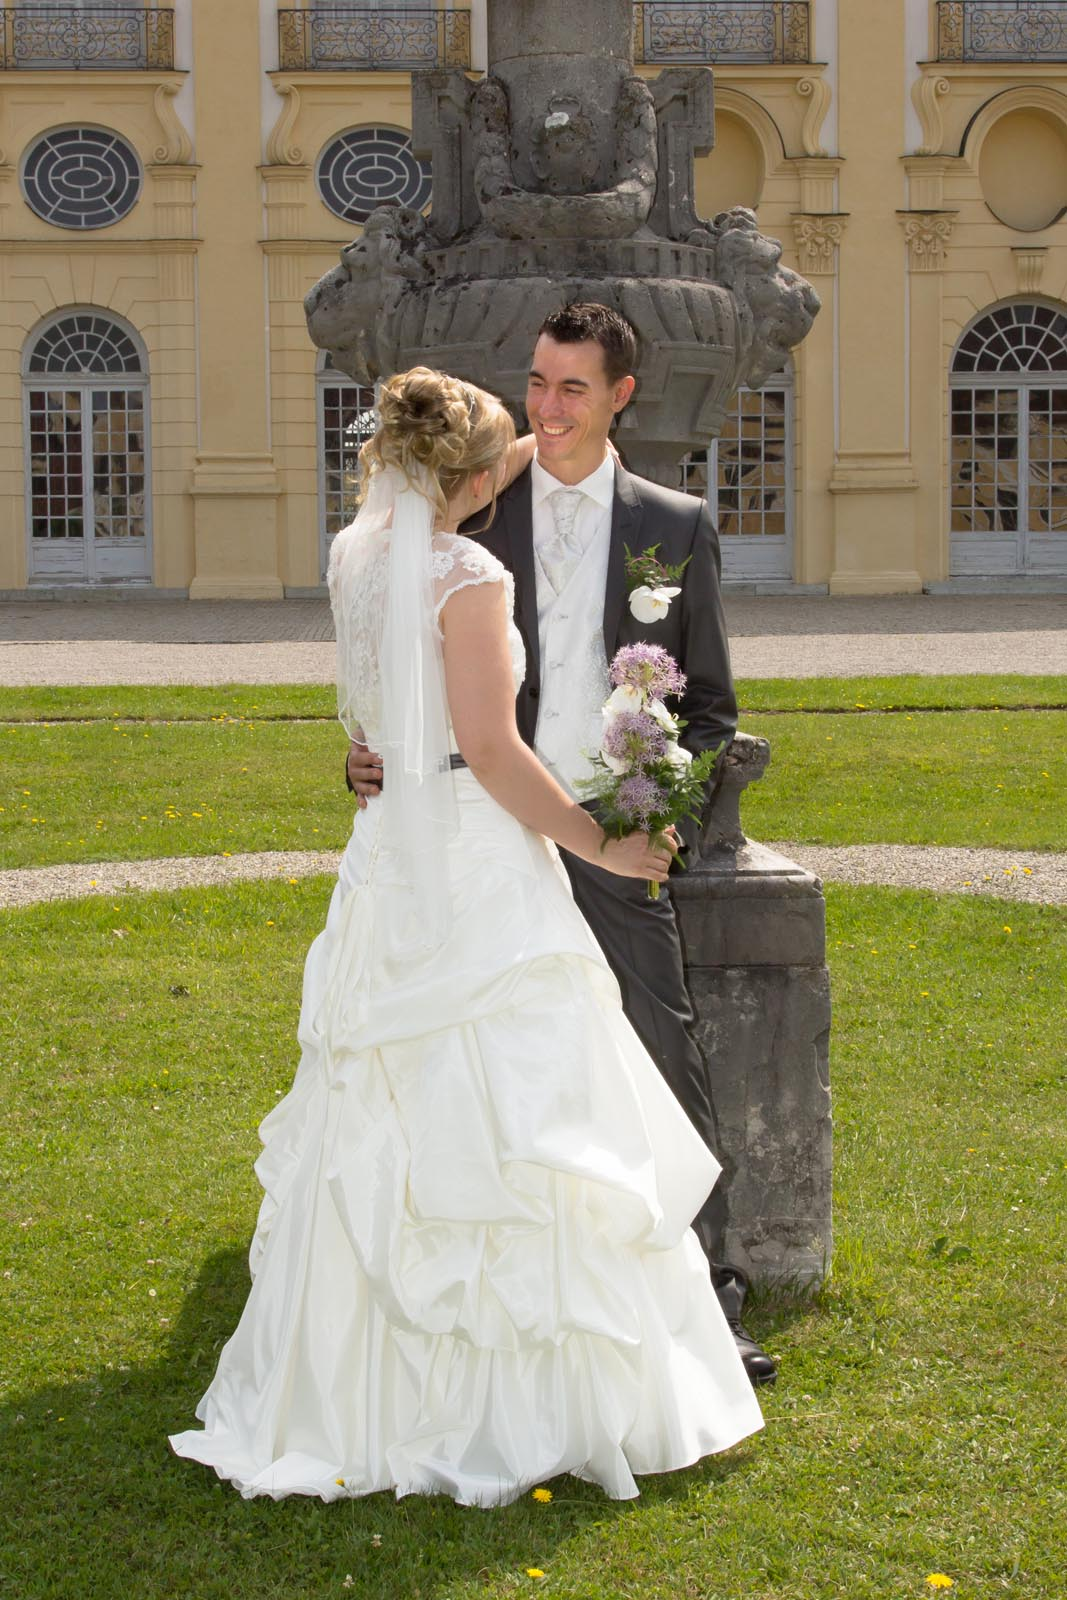 Hochzeit-Portraits-Jacob-Kirche-Hochzeit-Jacob-6978.jpg